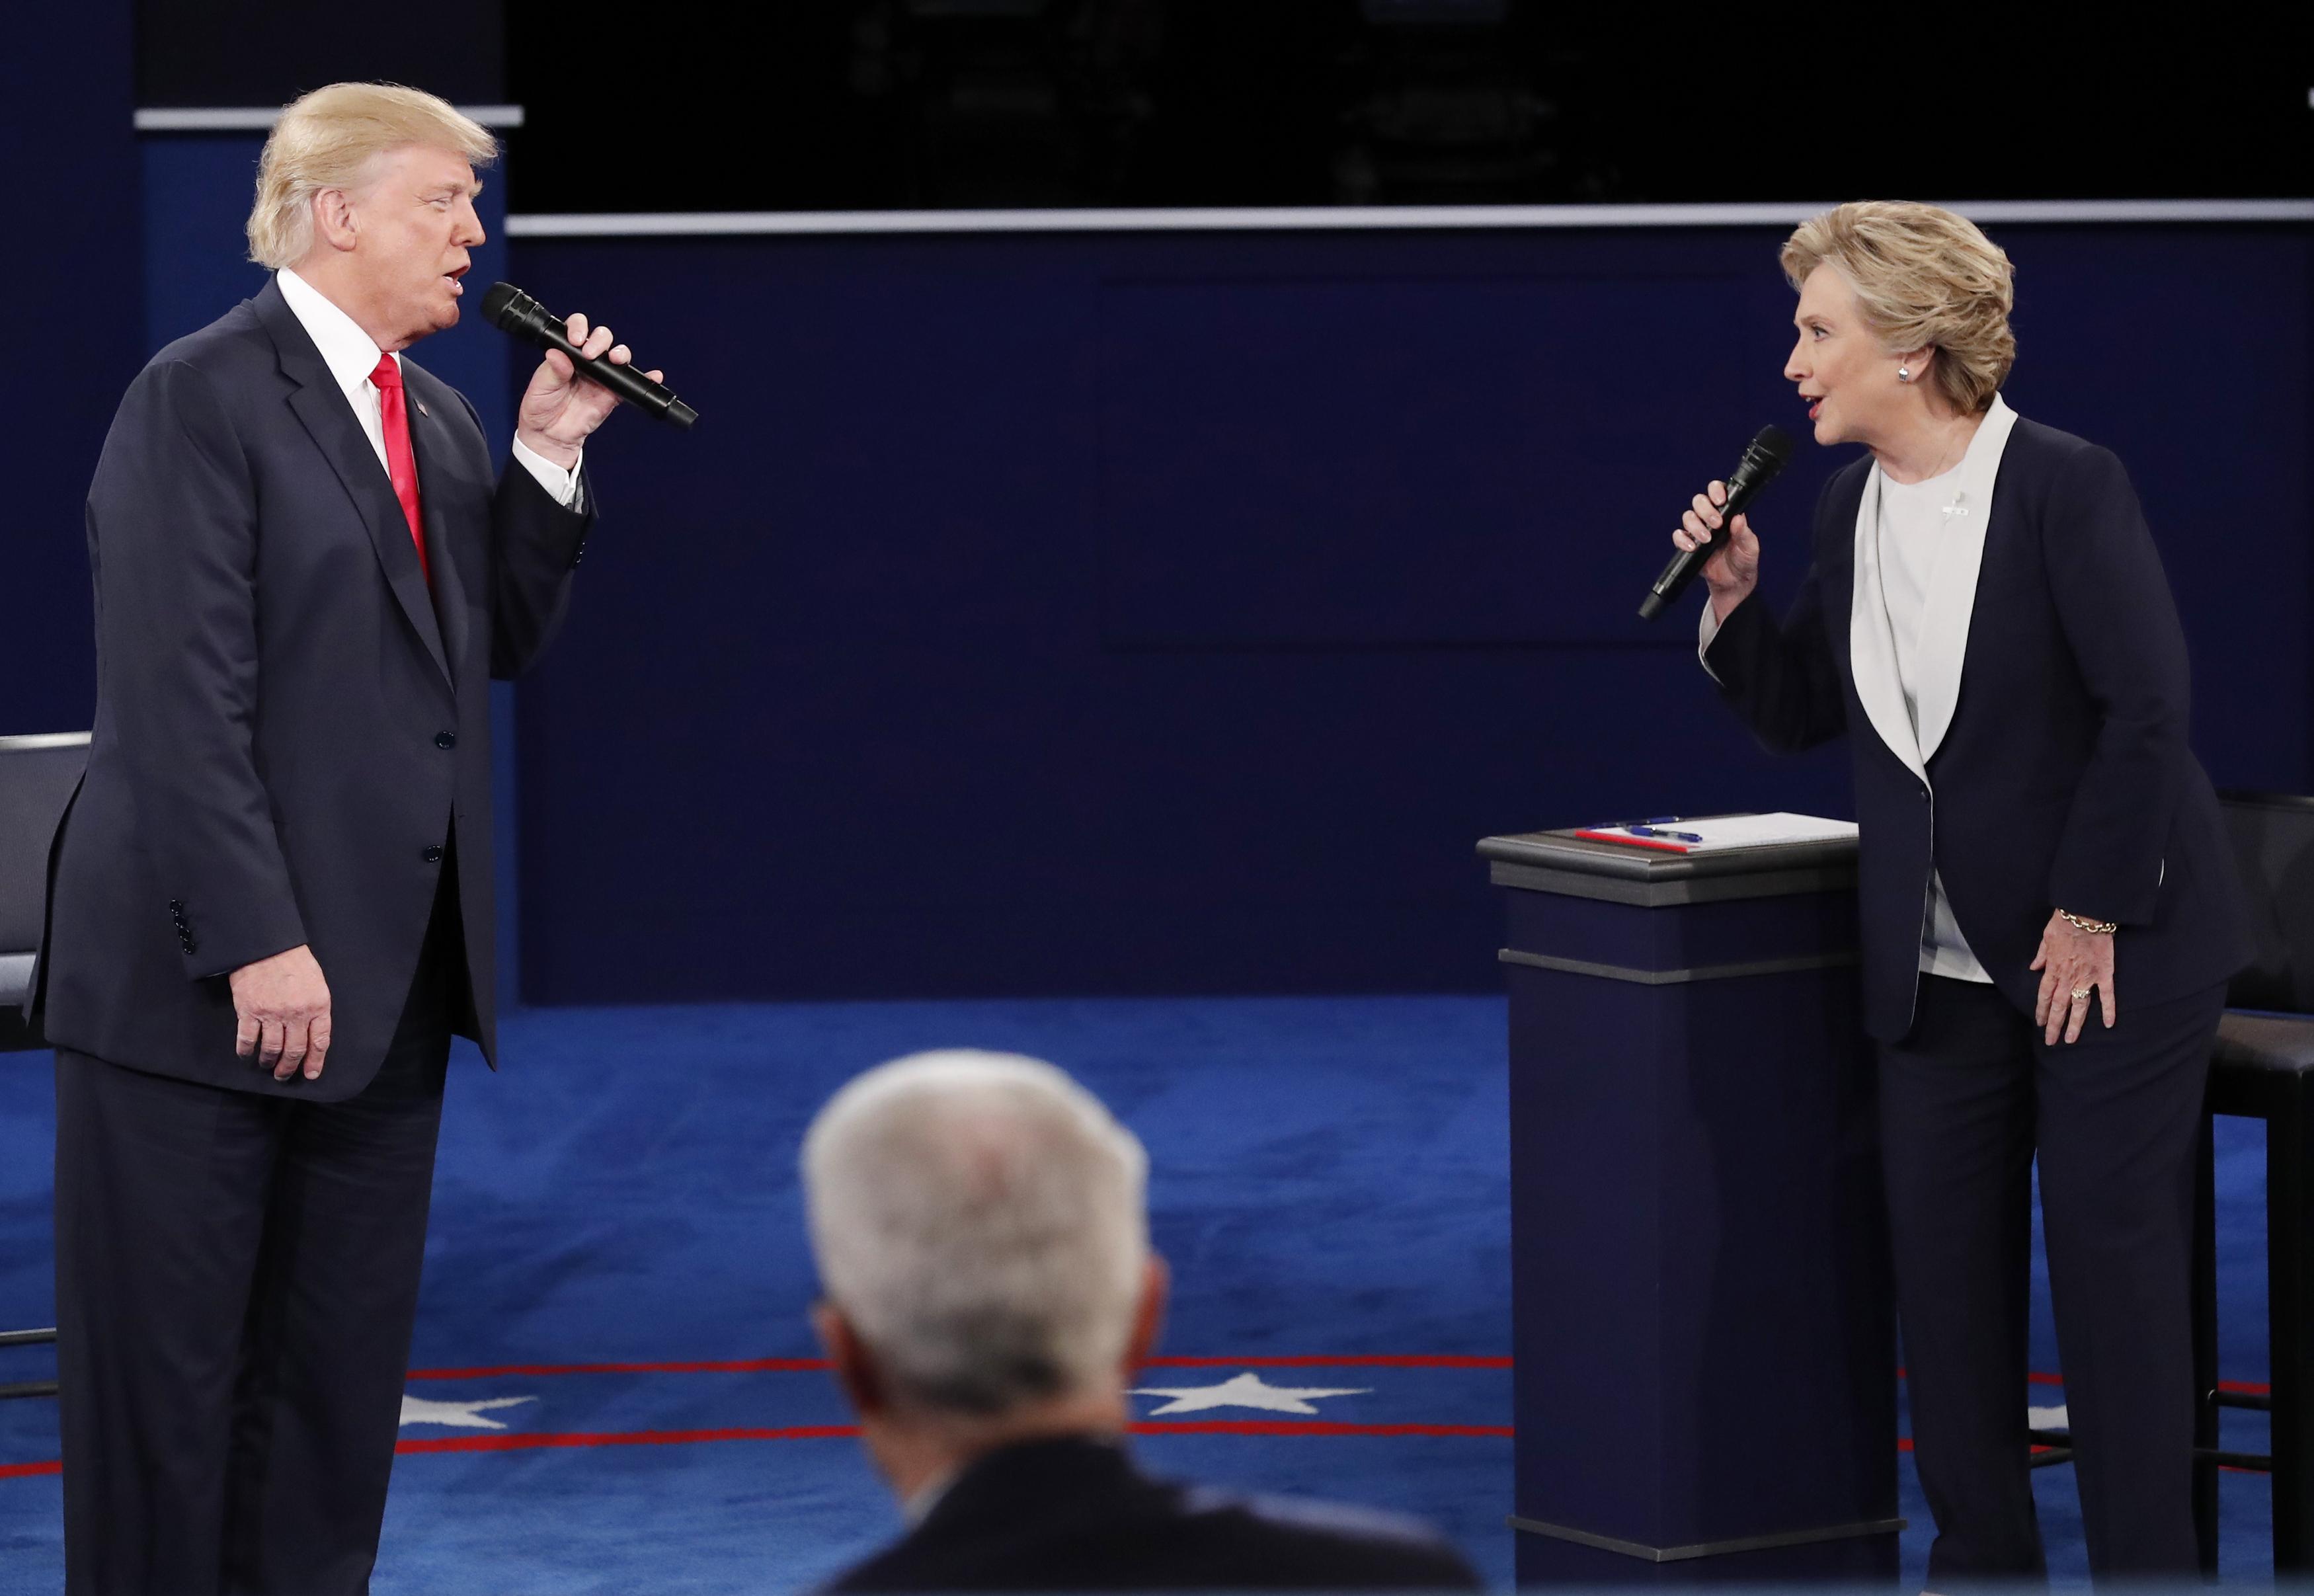 Republican U.S. presidential nominee Donald Trump and Democratic U.S. presidential nominee Hillary Clinton speak during their presidential town hall debate at Washington University in St. Louis